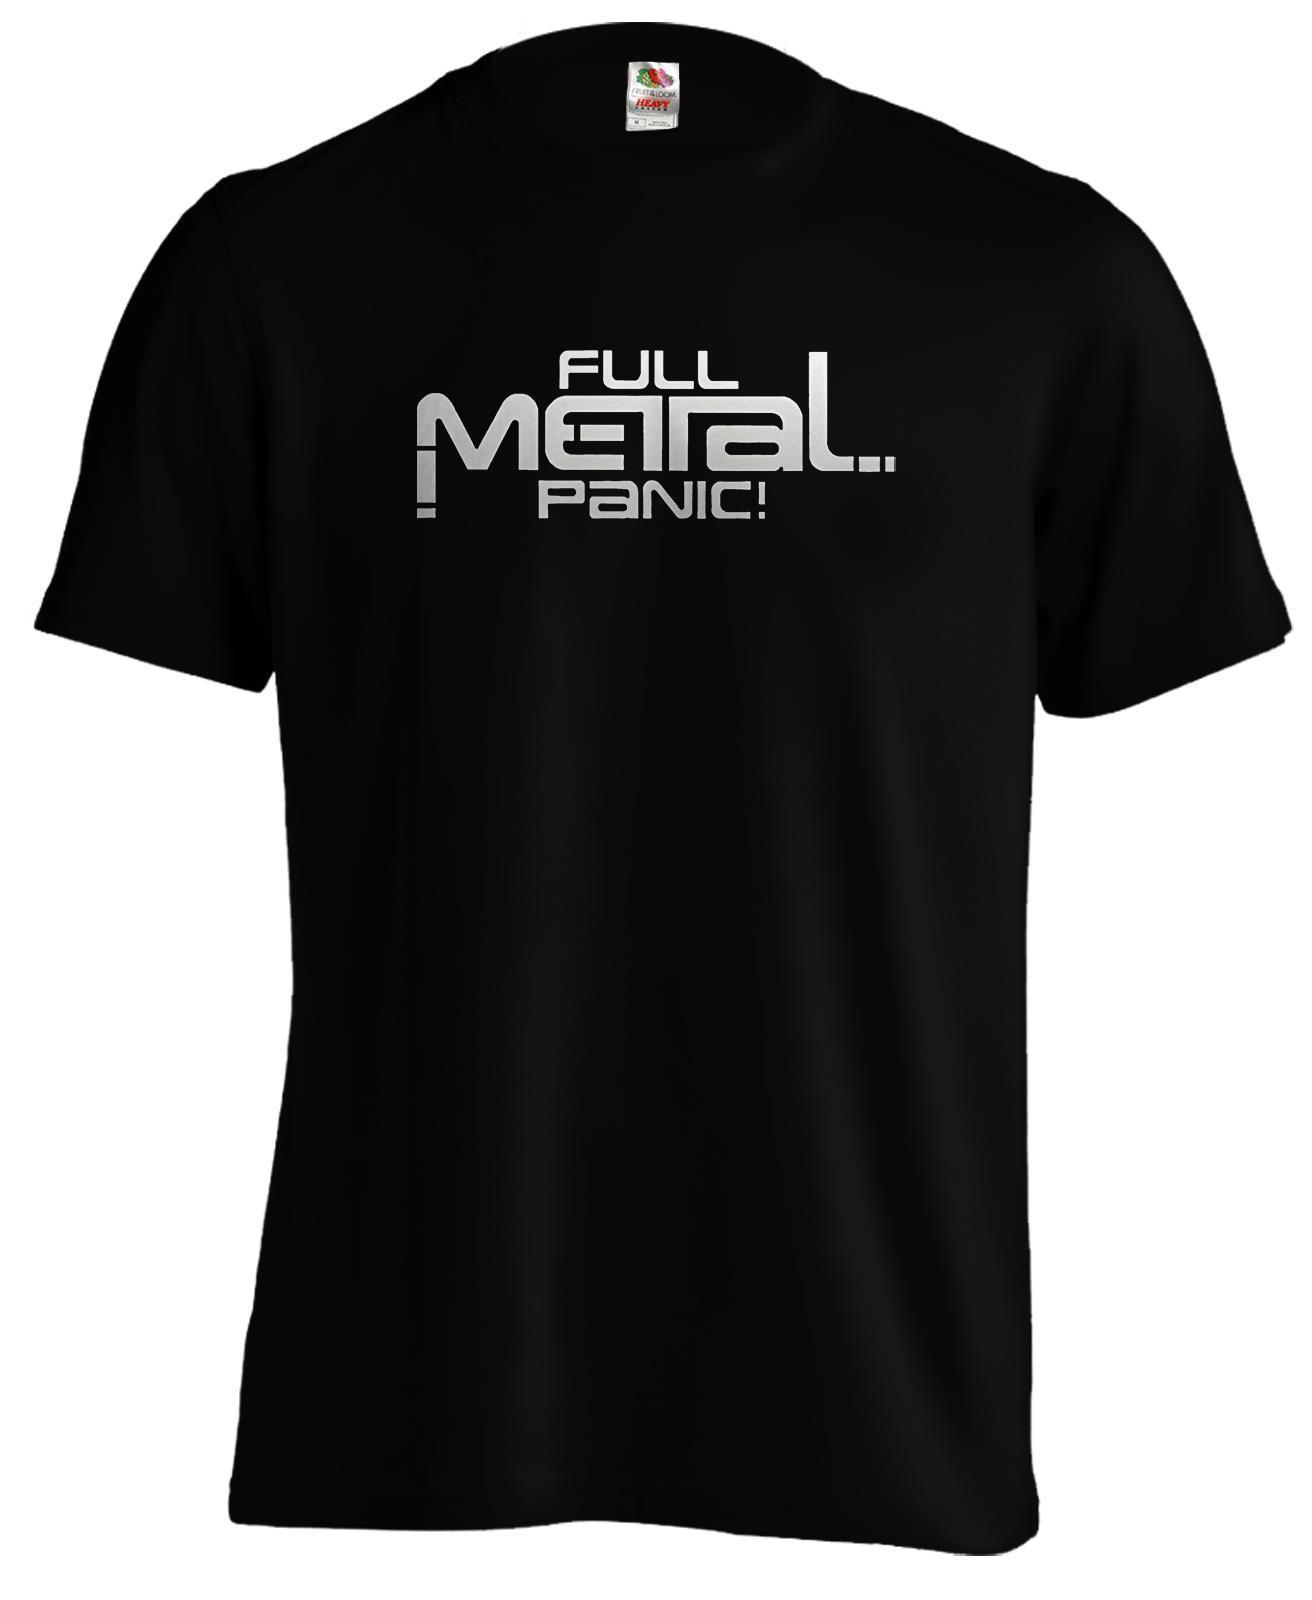 Full Metal Panic Logo Anime Manga T Shirt Tee New Shirts Funny Tops Unisex